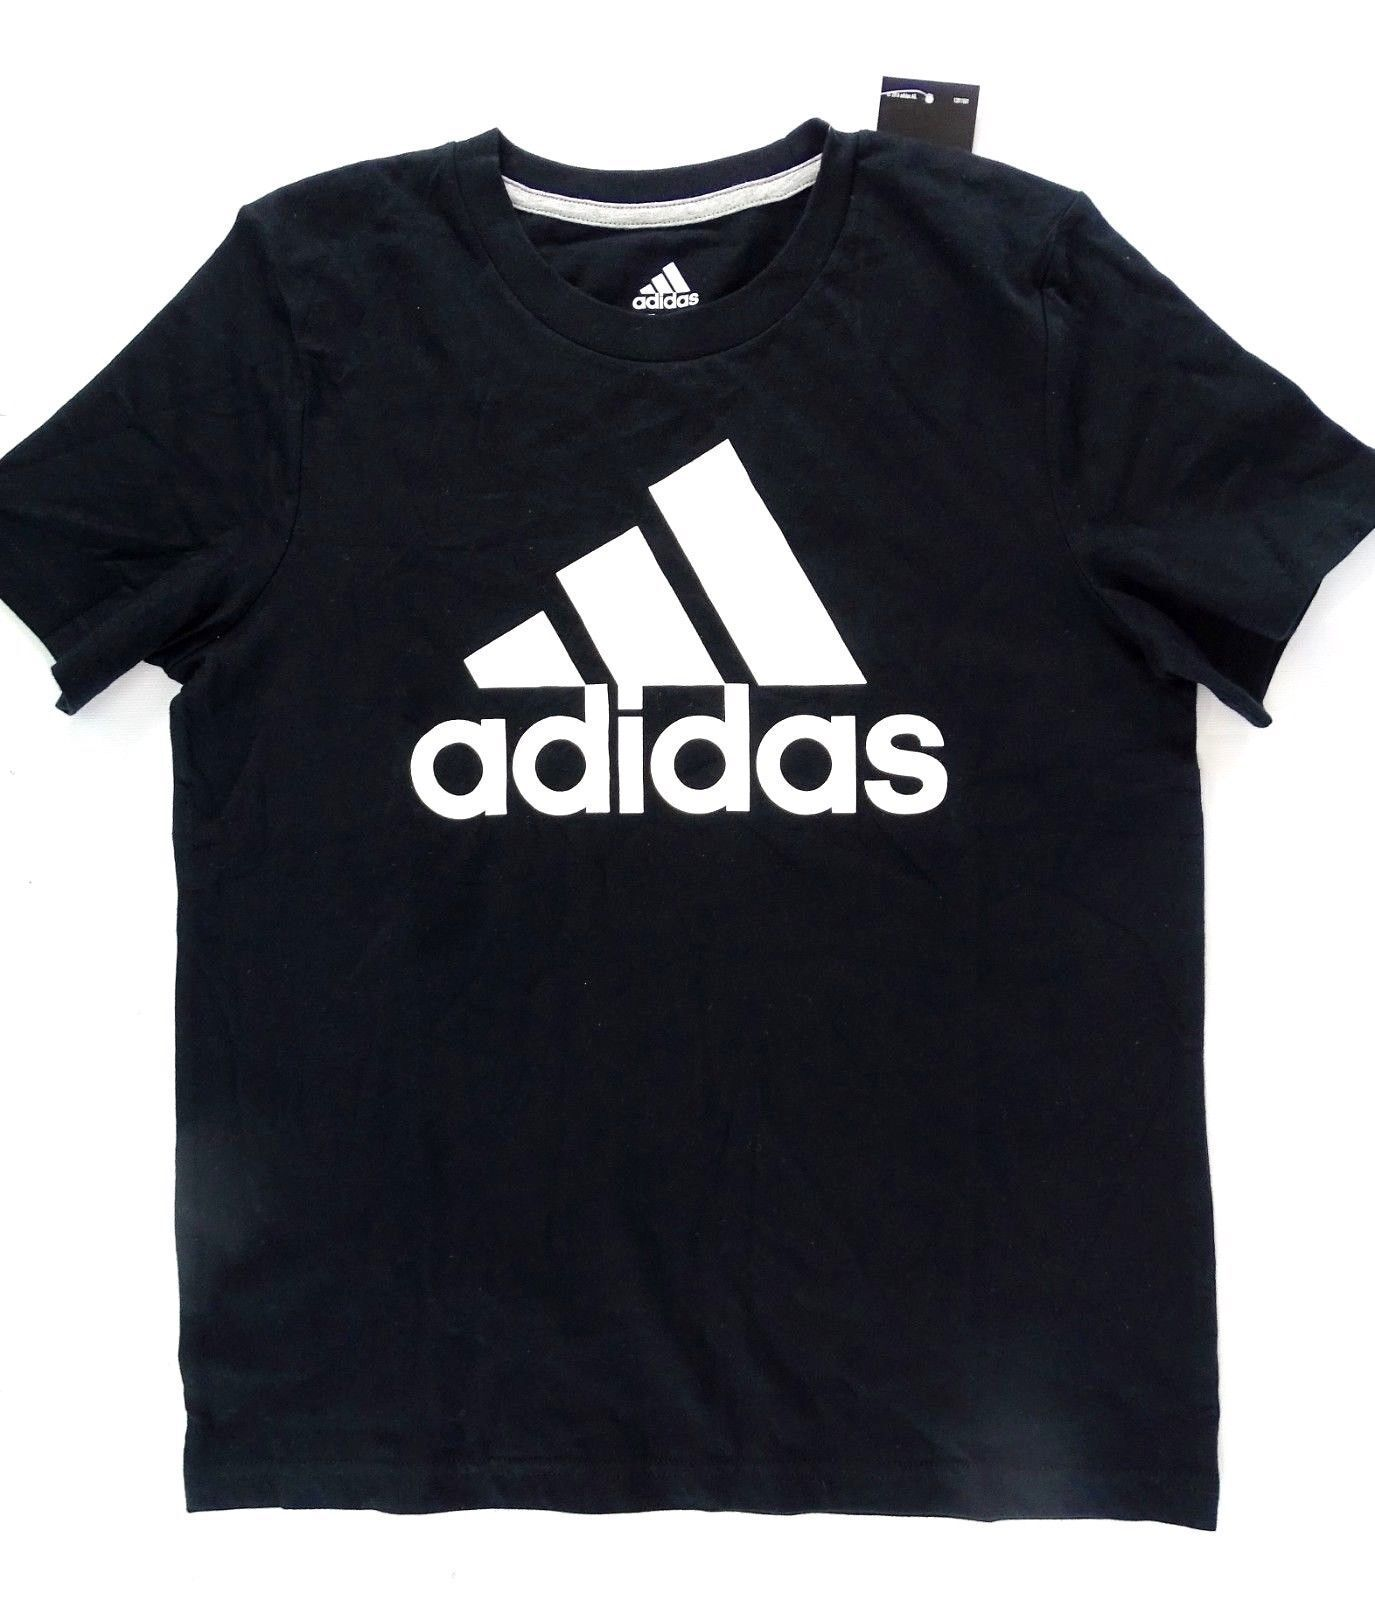 NEW Adidas Girls' Cotton Logo Tee, Black Size S